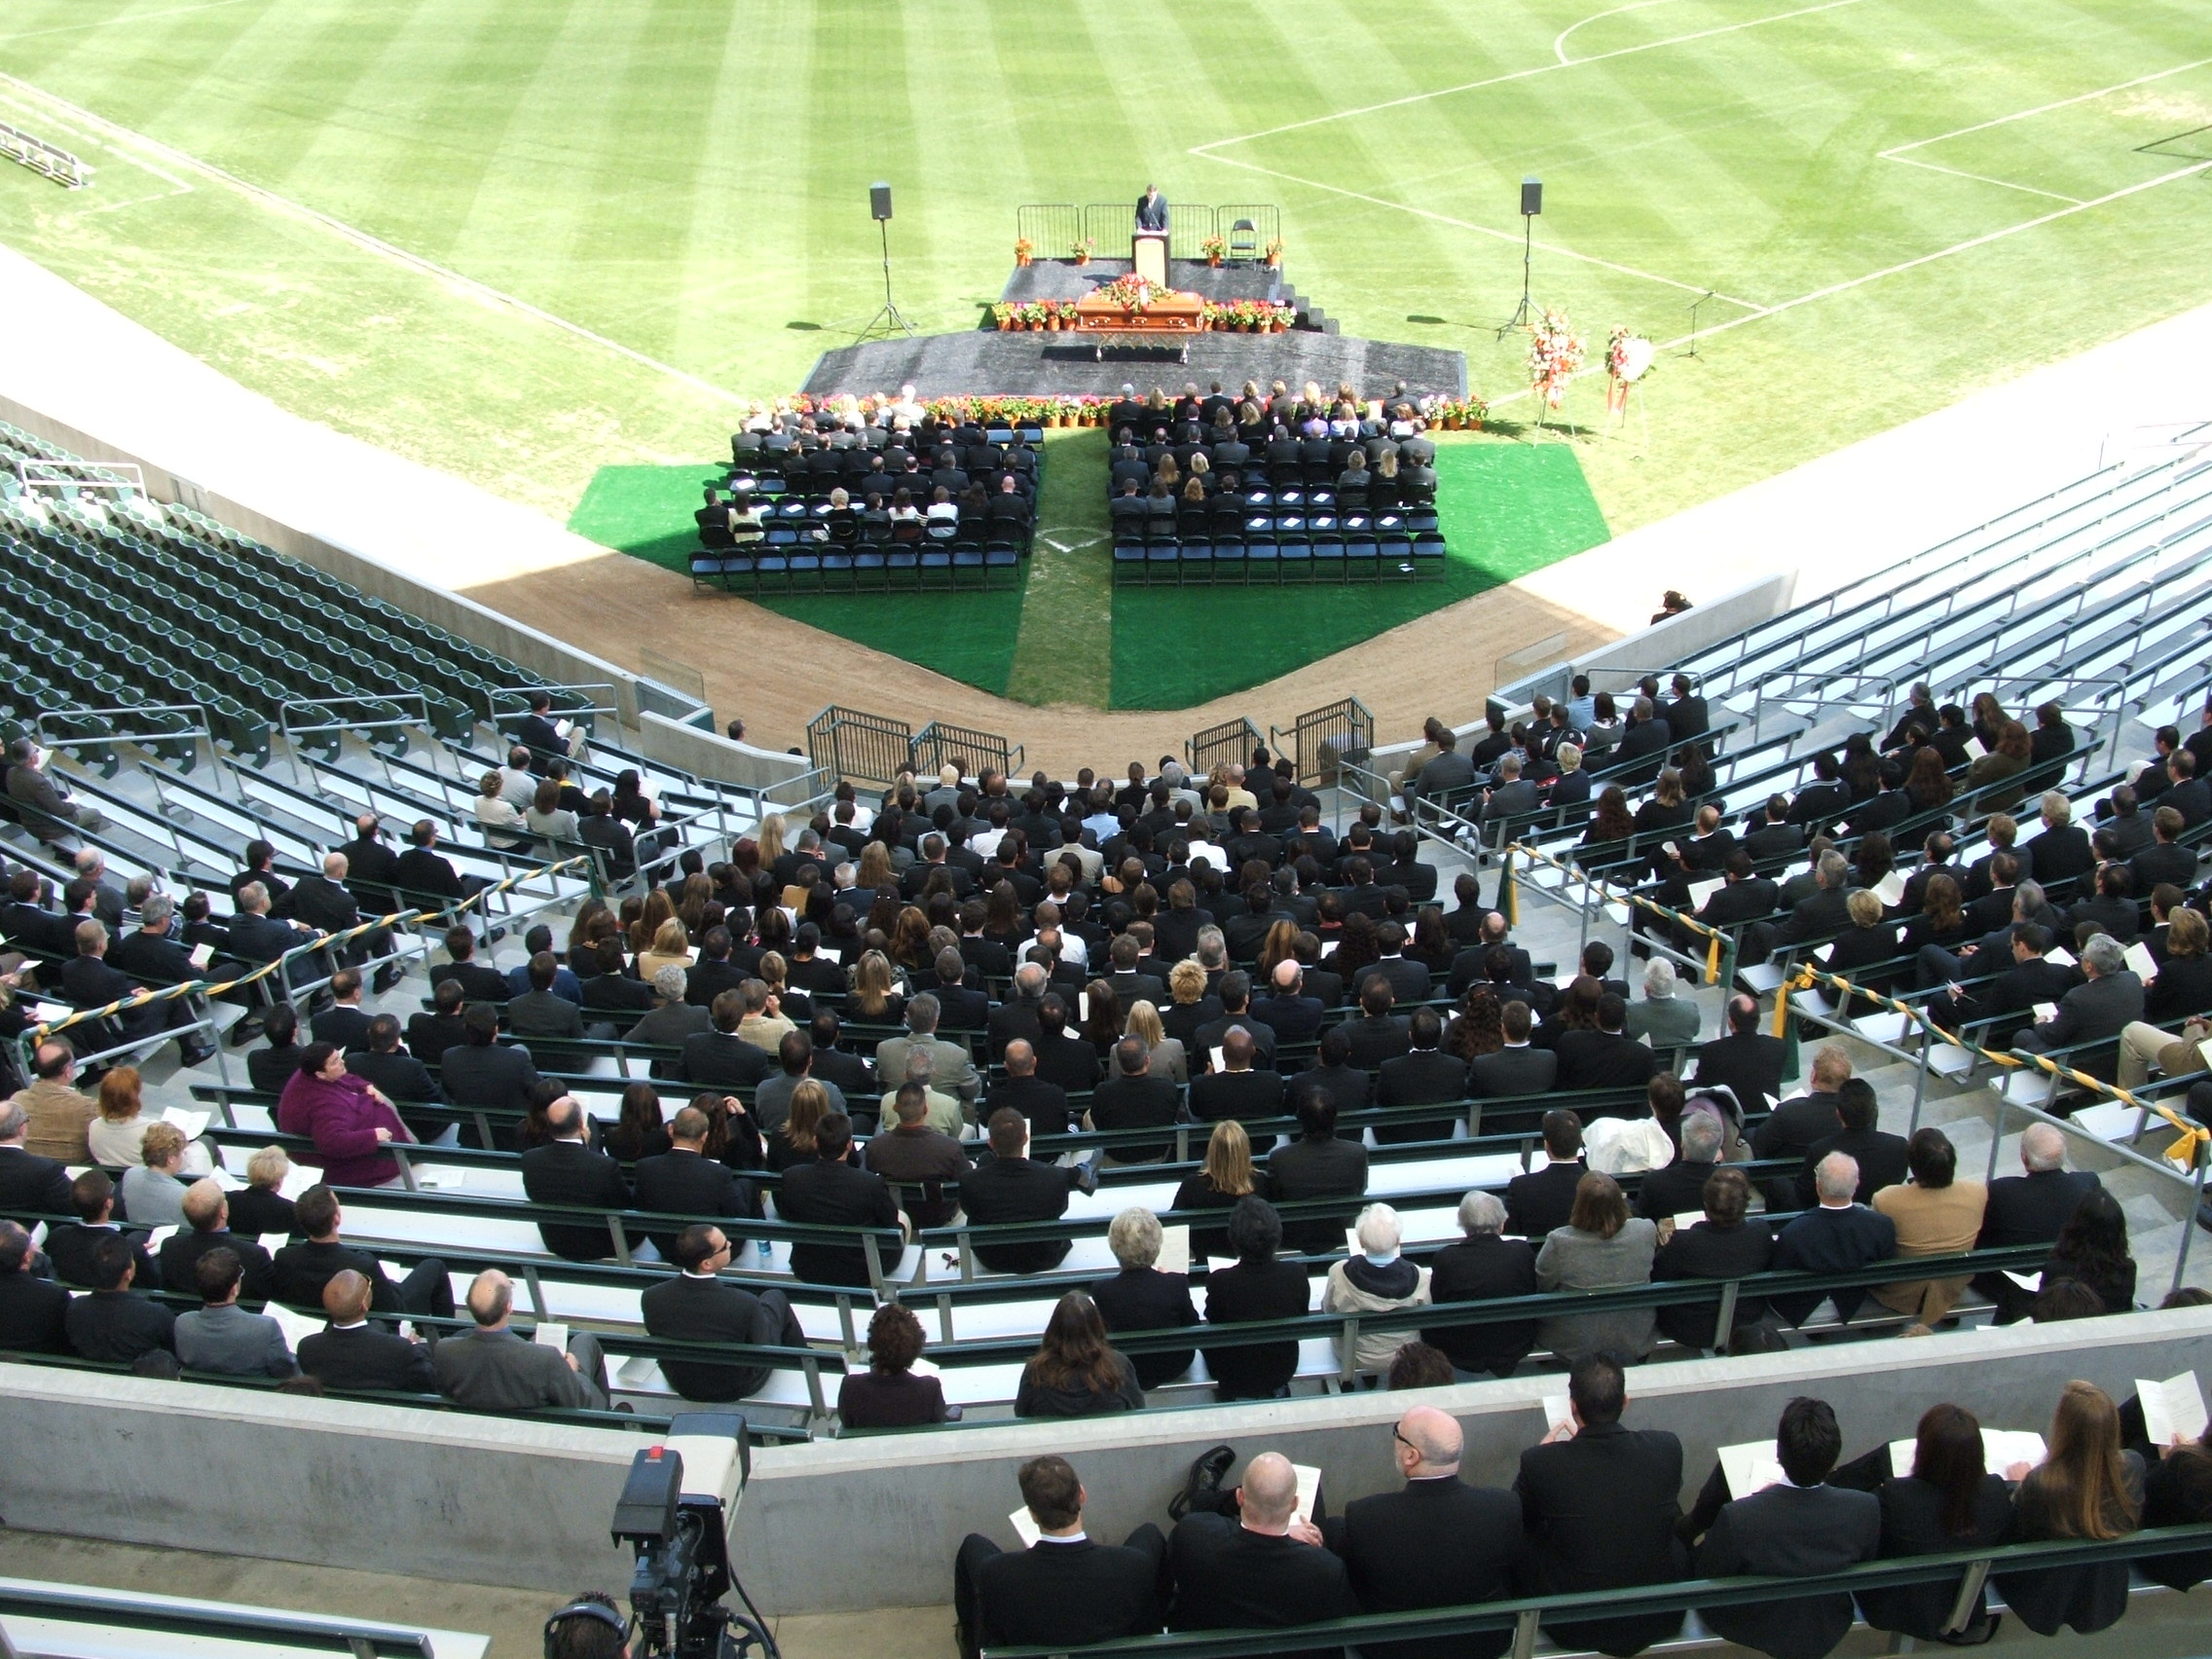 Athletic Field Memorial Service